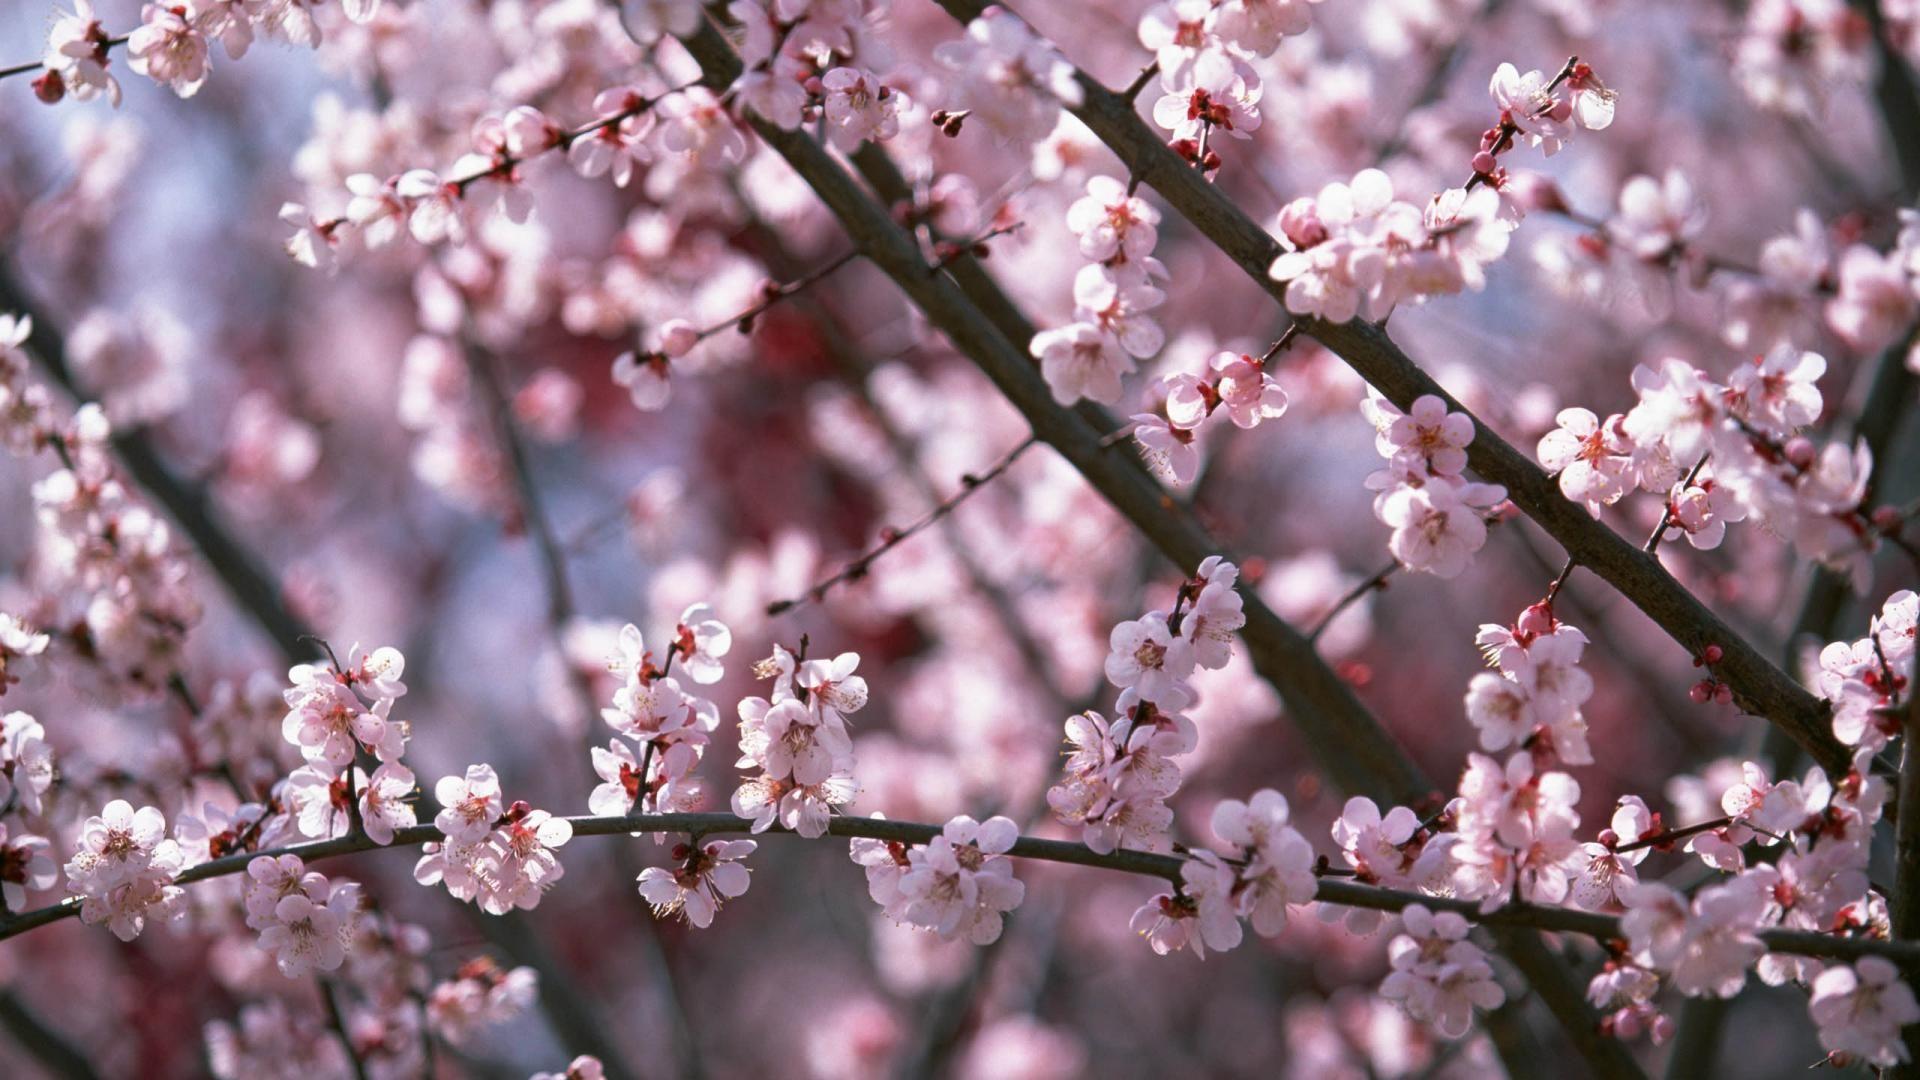 Wallpapers Sakura Hd 1920 1080 Hd Wallpapers Cherry Blossom Wallpaper Sakura Cherry Blossom Sakura Flower